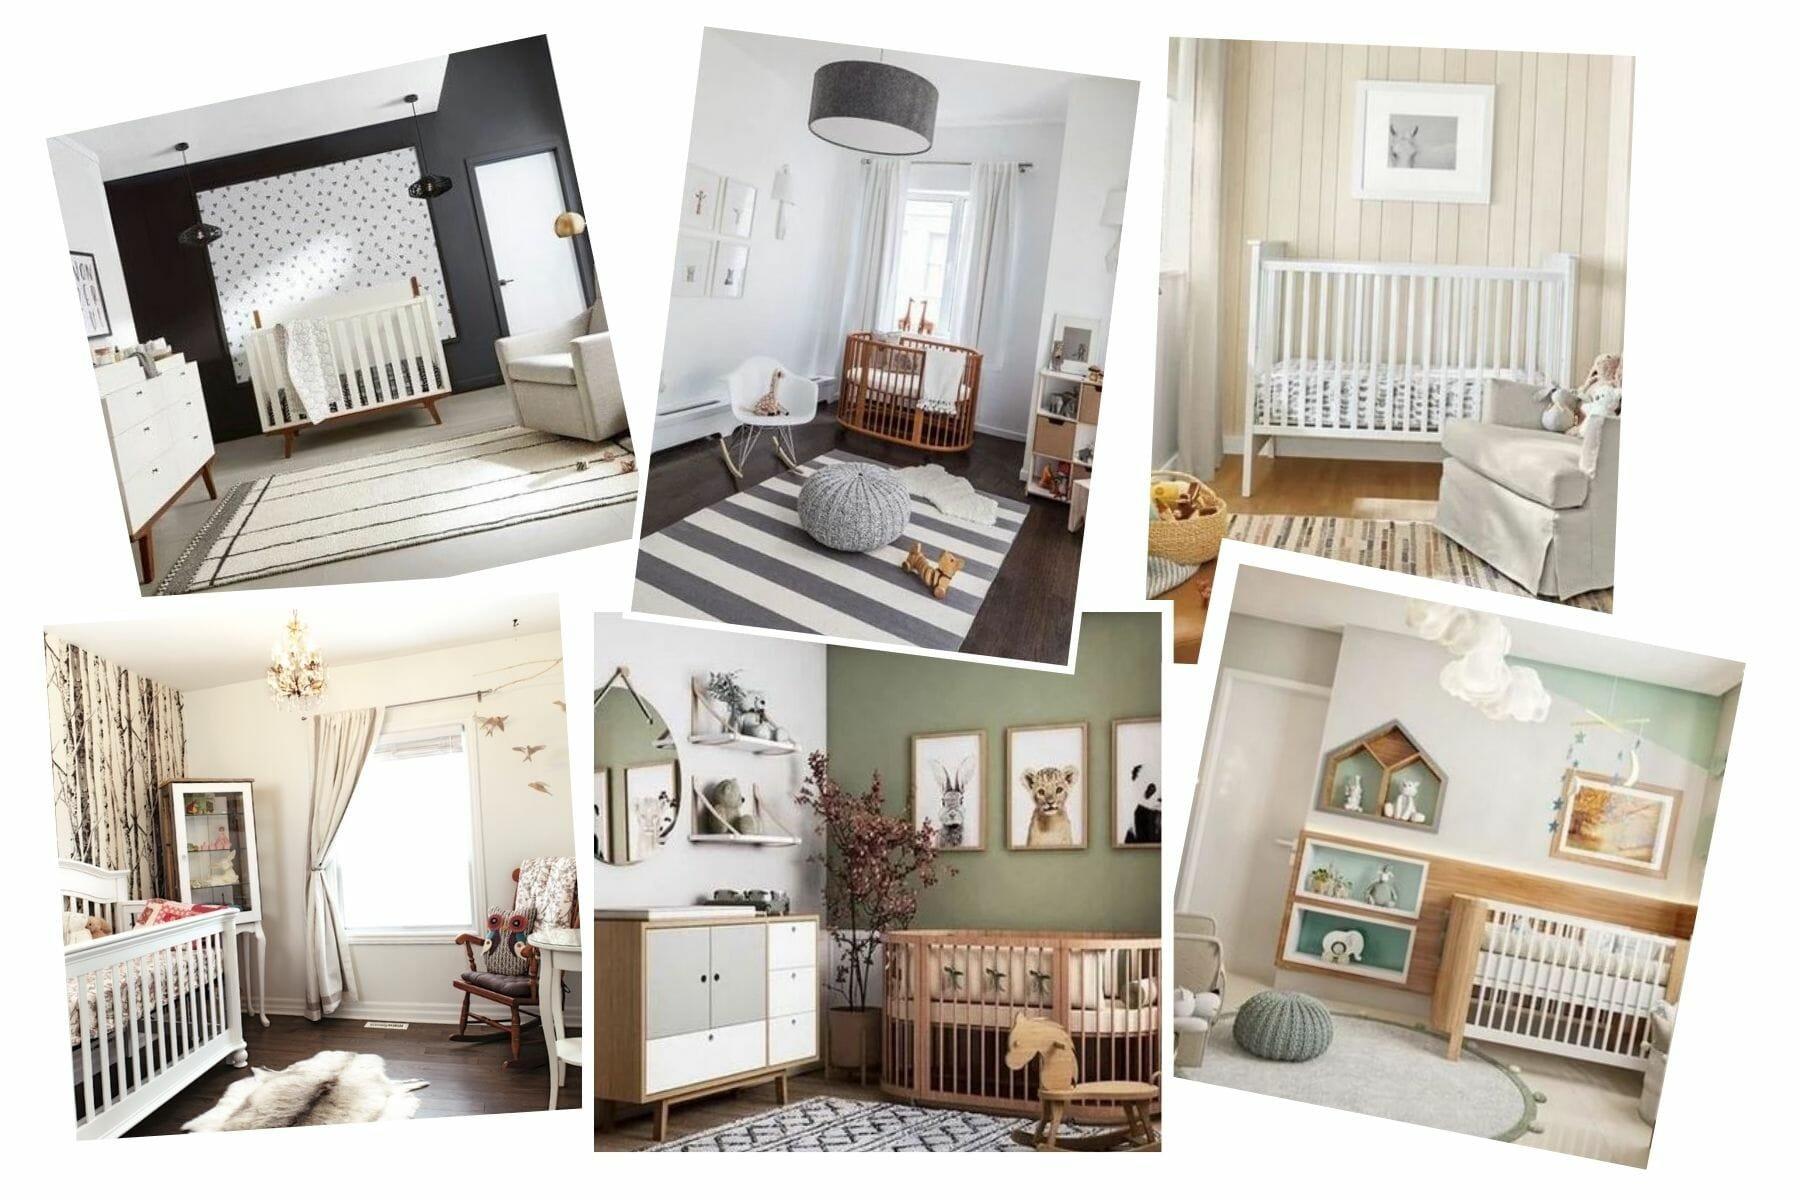 Woodland themed nursery inspiration board